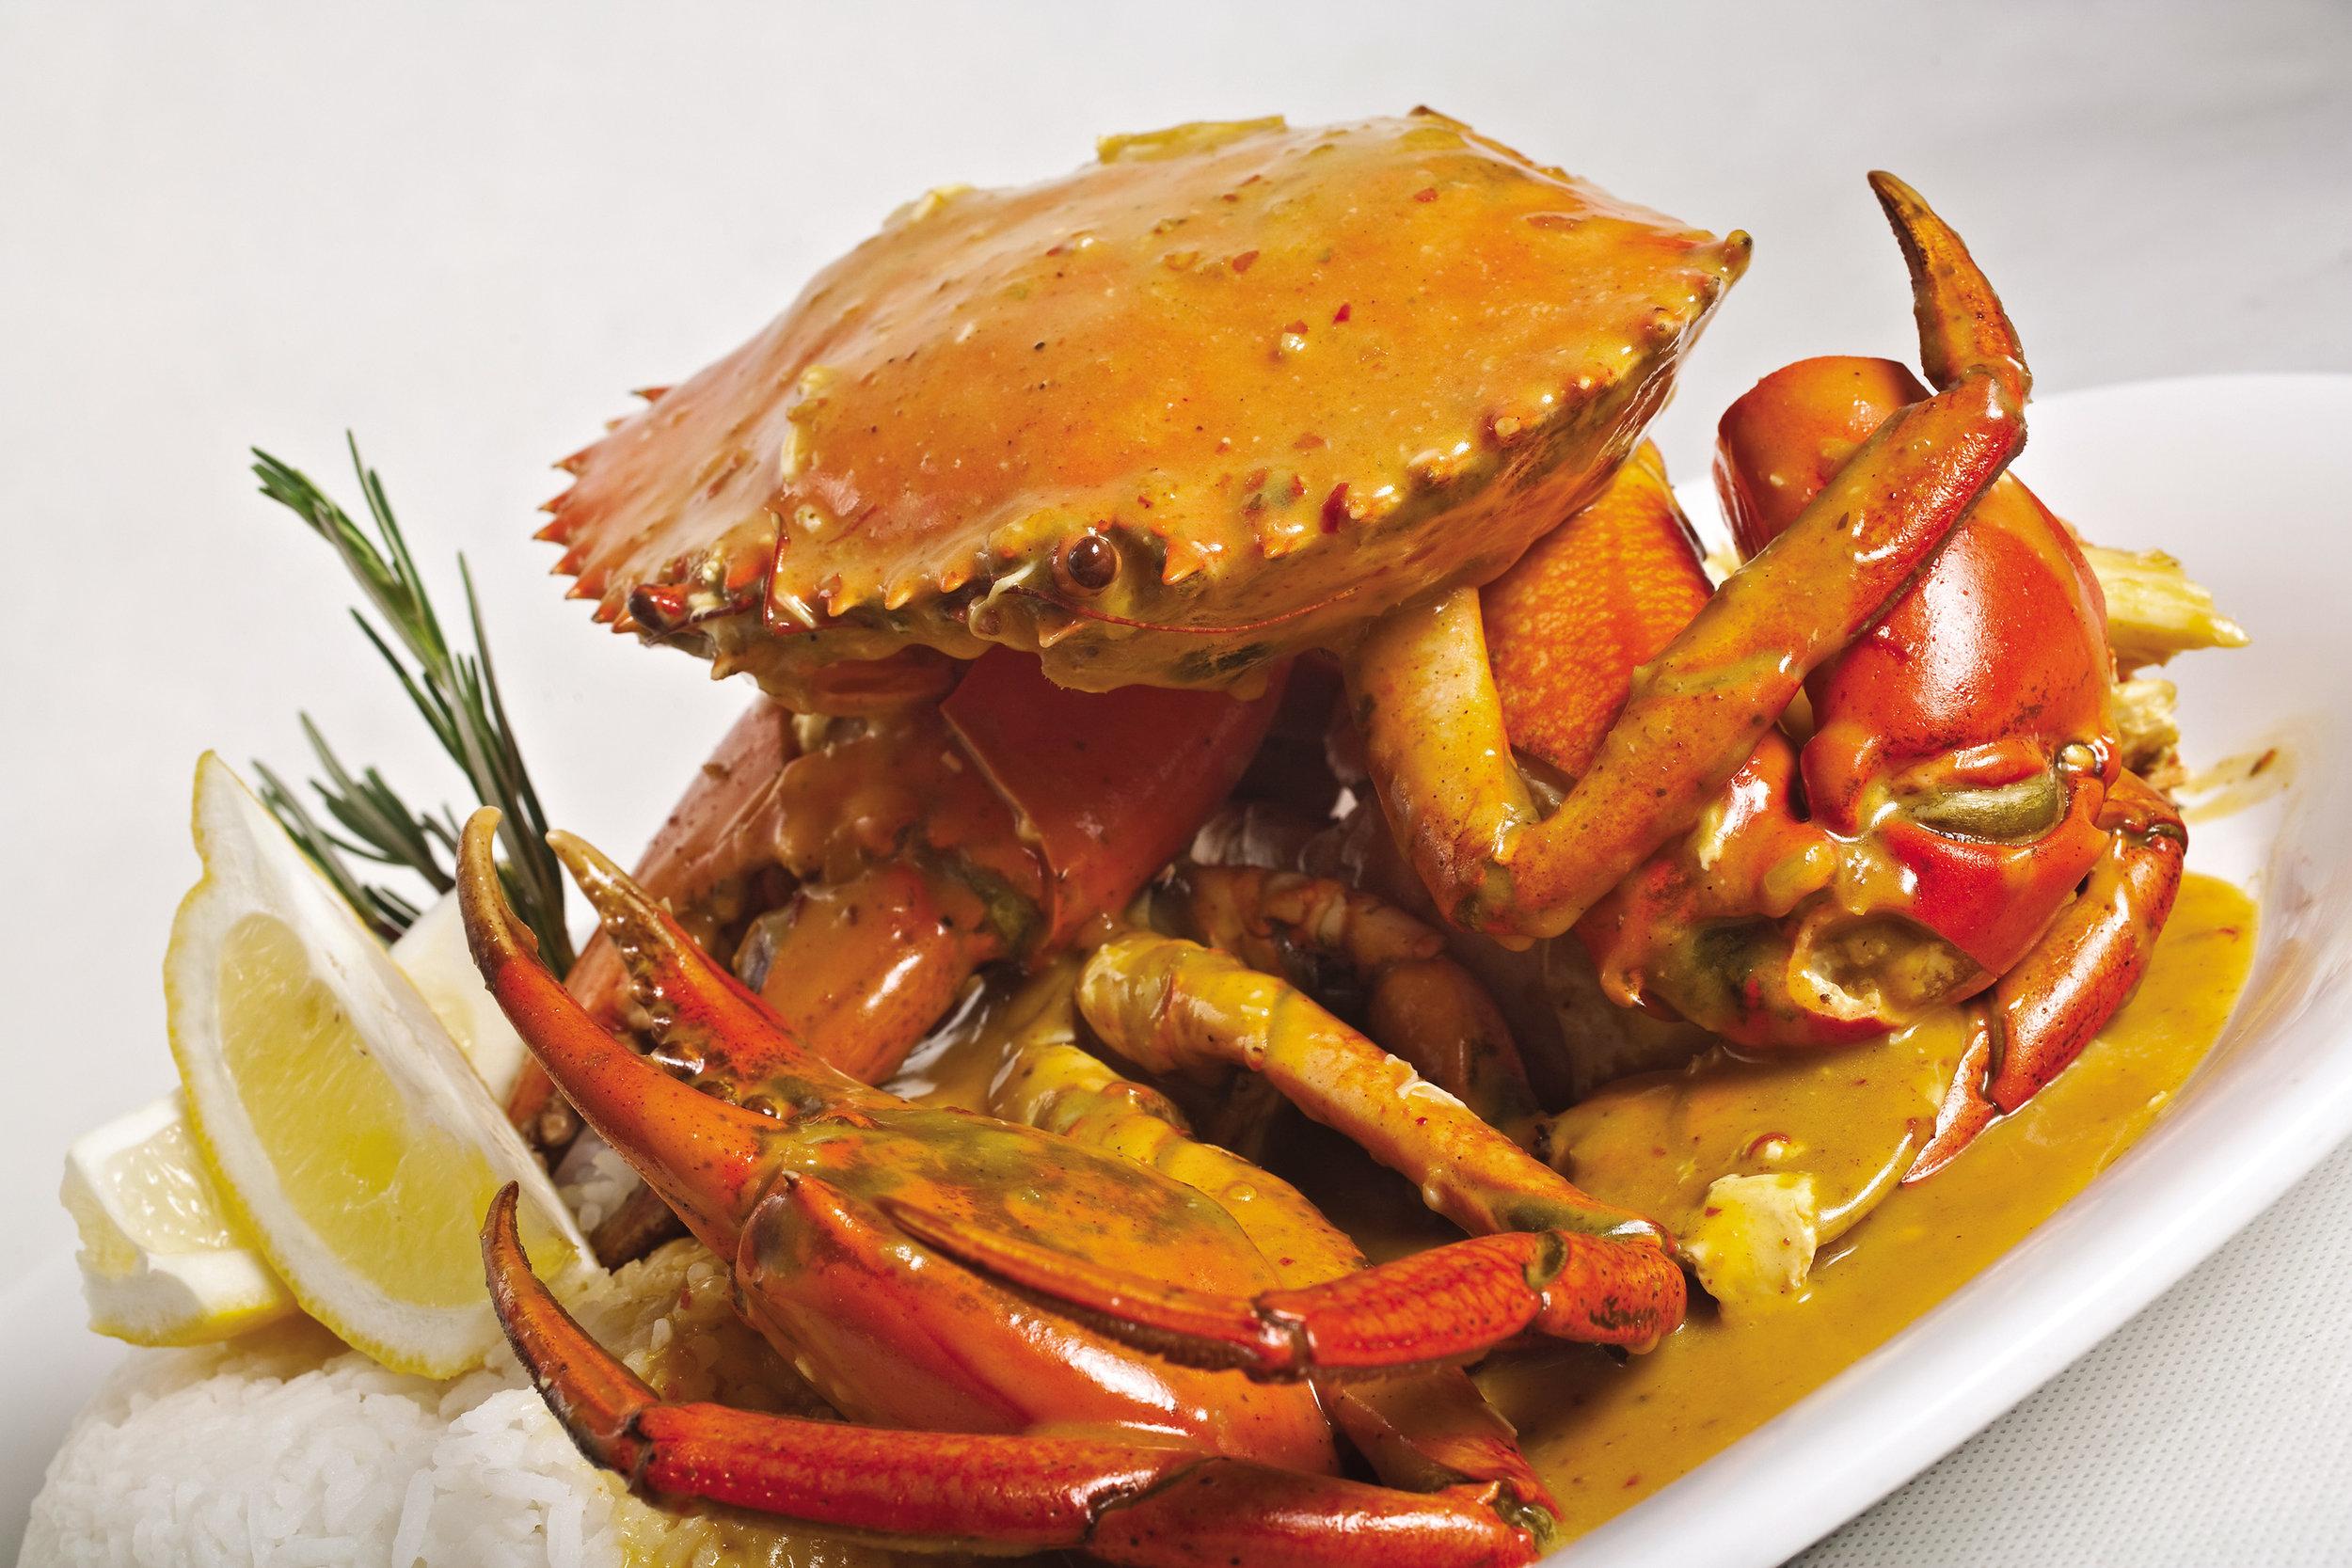 hero image crab.jpg